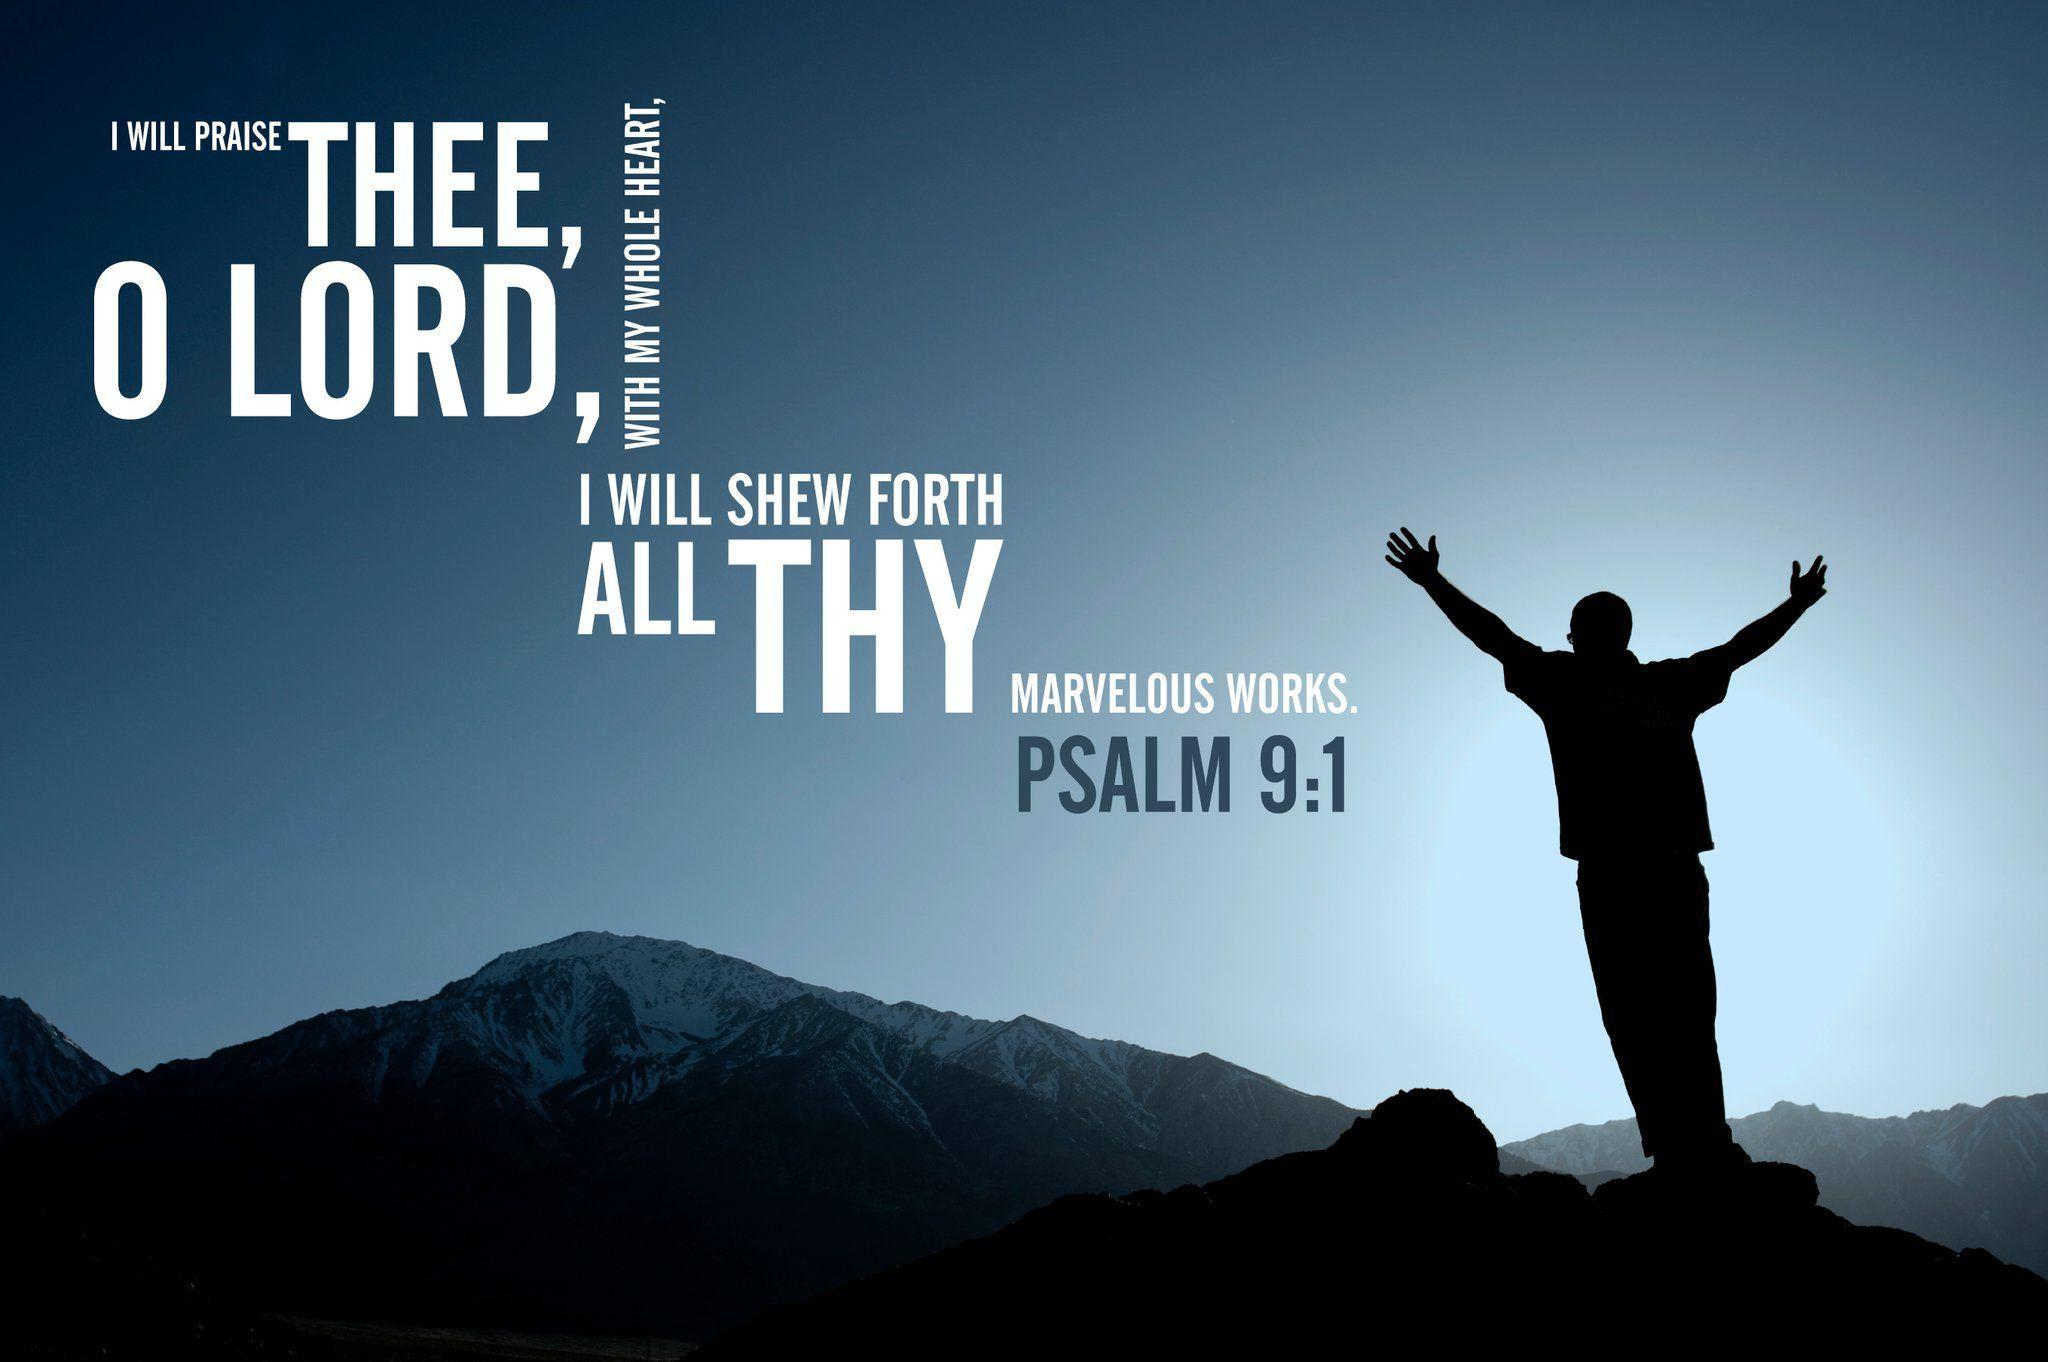 christian wallpaper psalms - photo #17